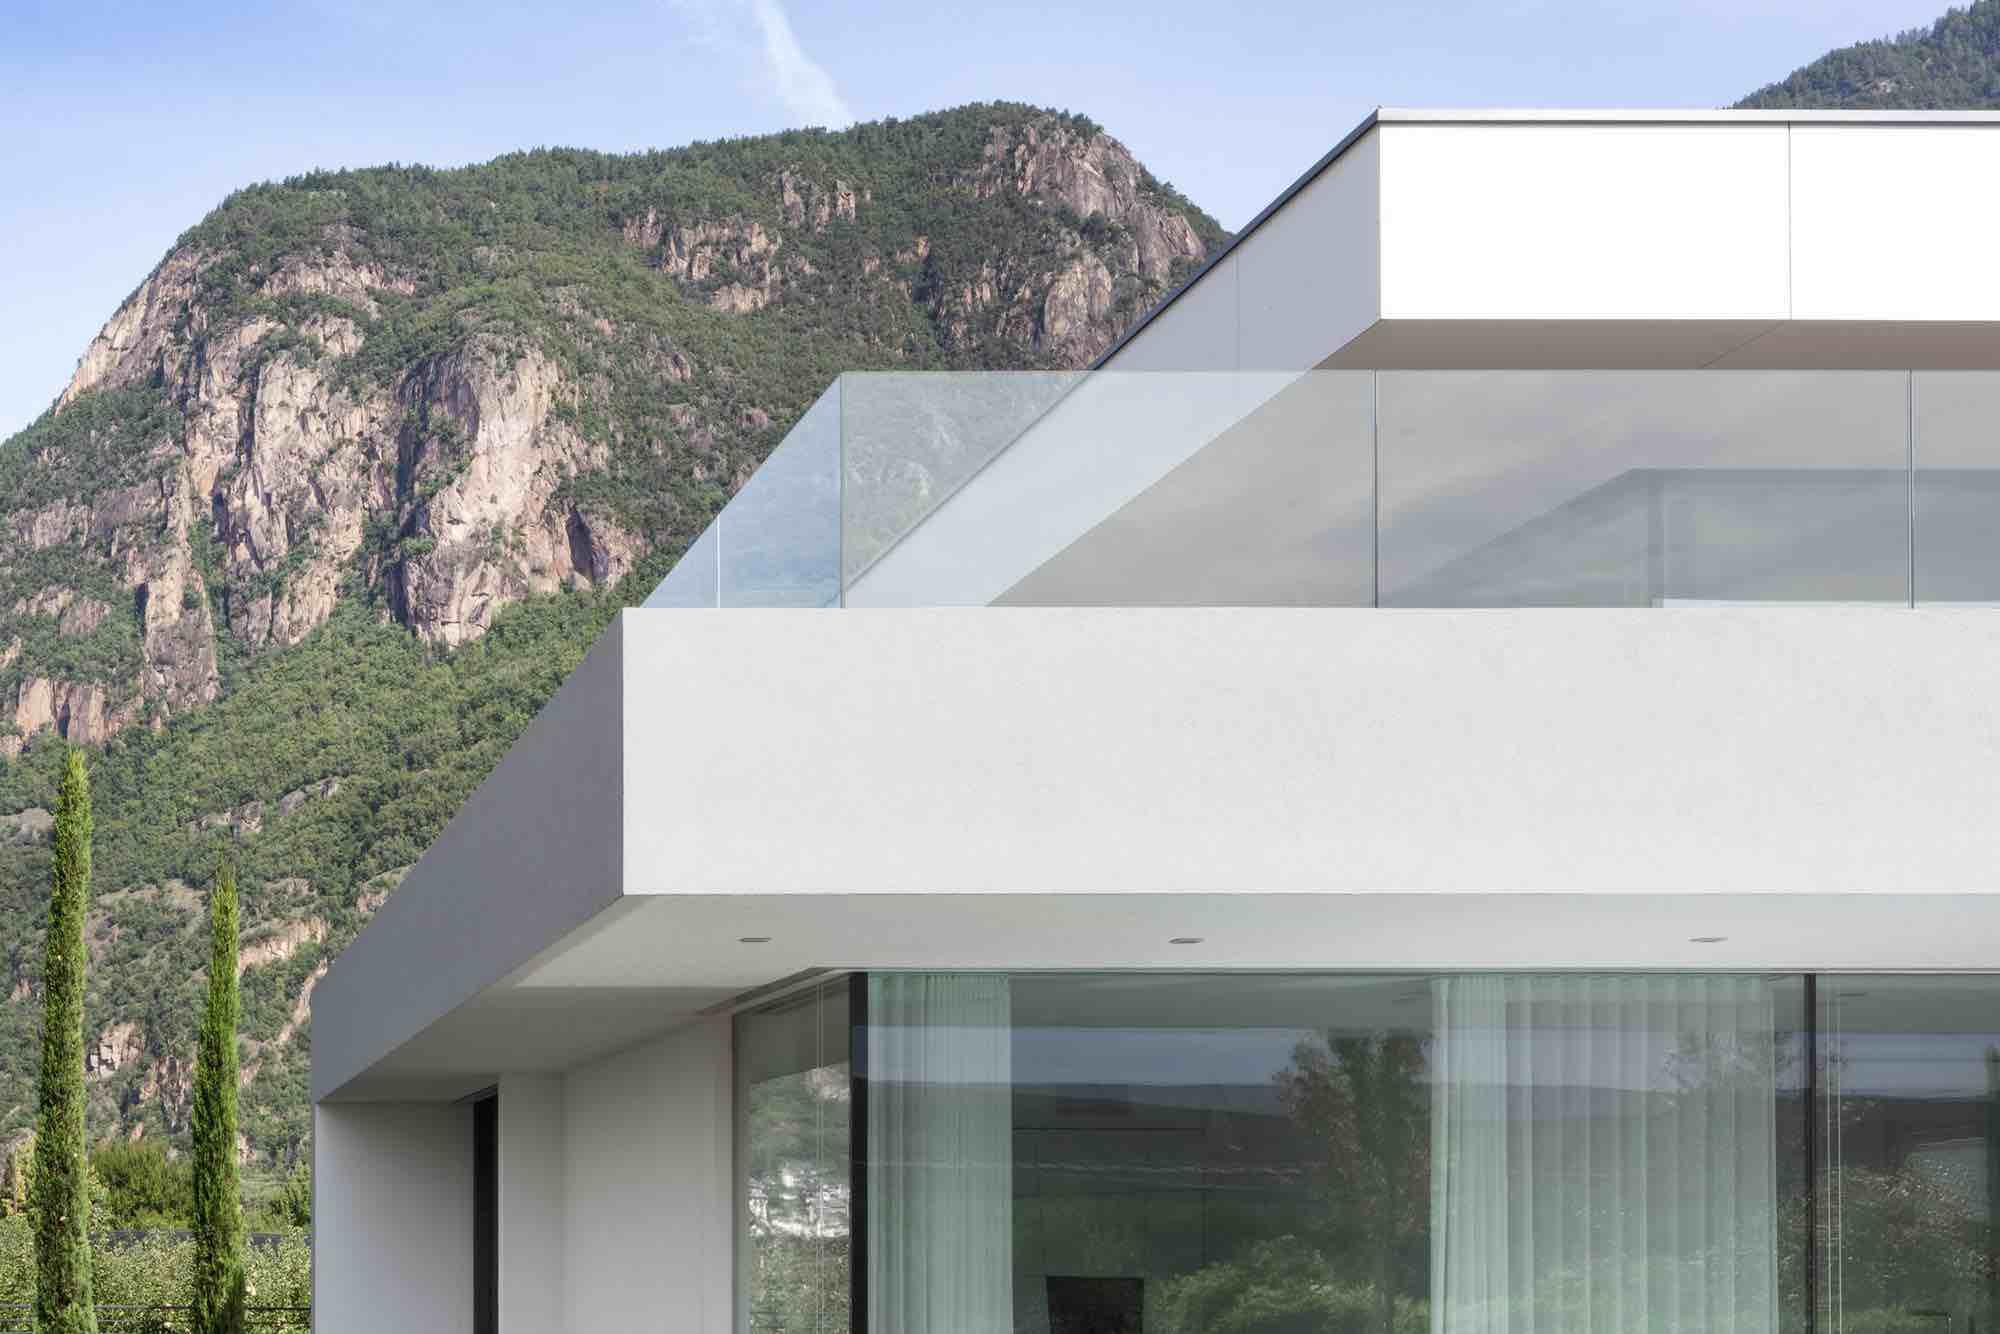 m2-house-monovolume-architecture-design_villa_moritzing_05